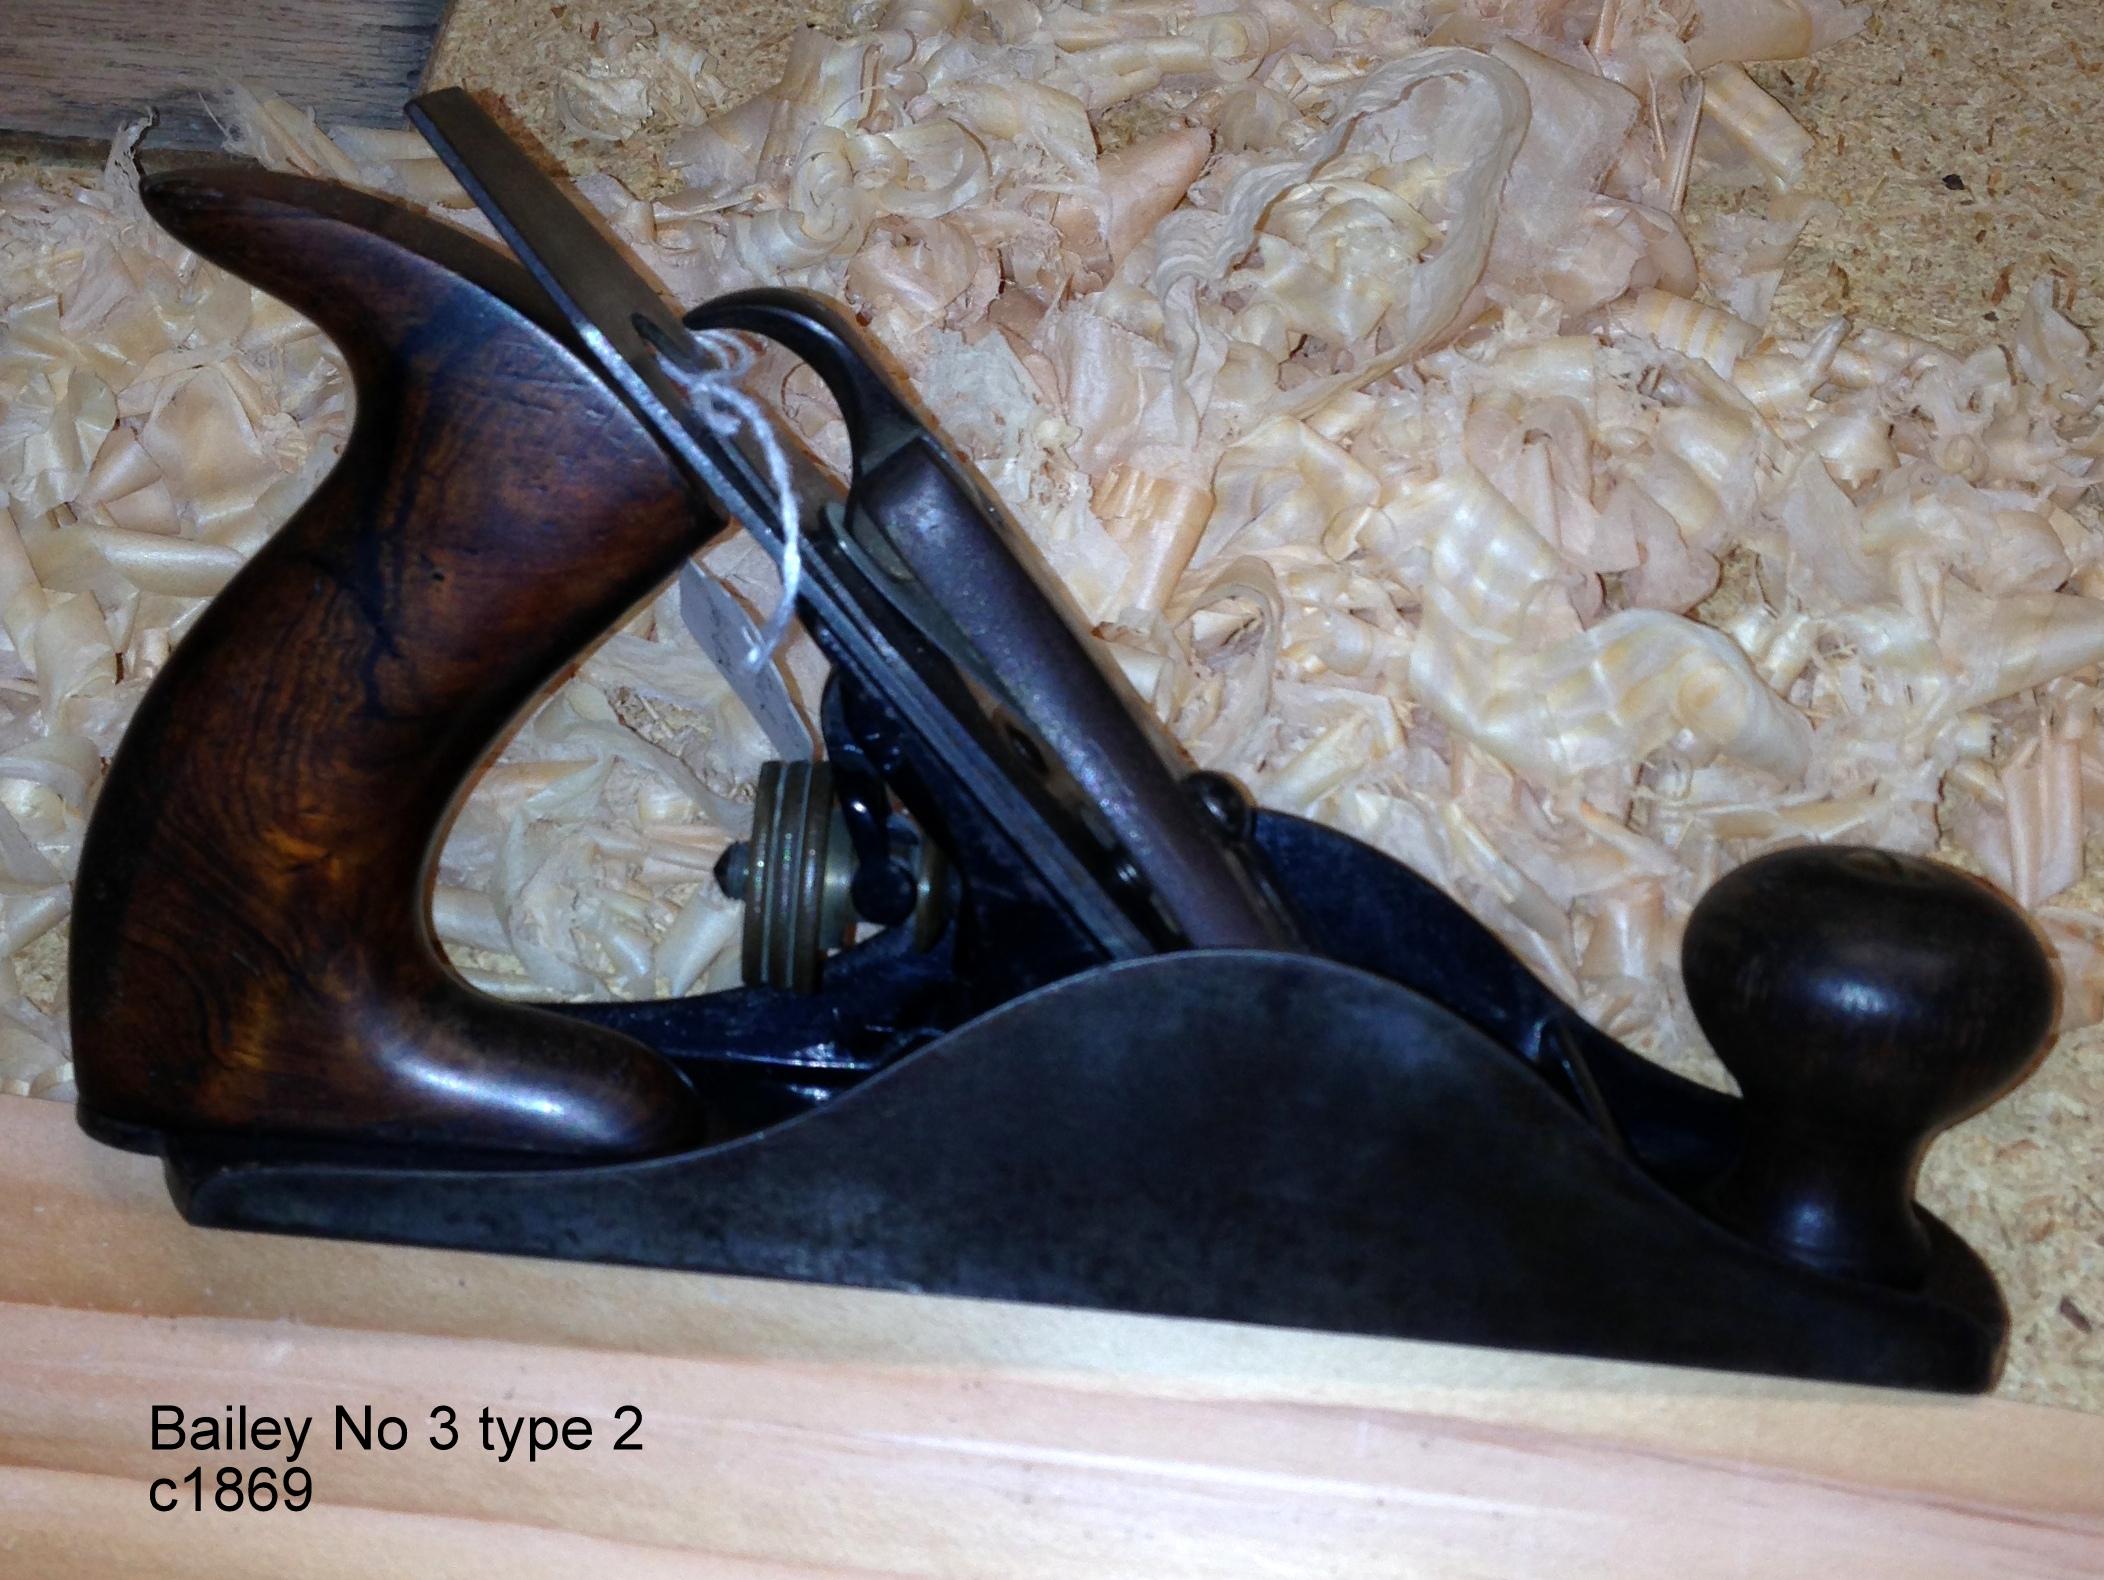 Bailey No 3 type 2 c 1969